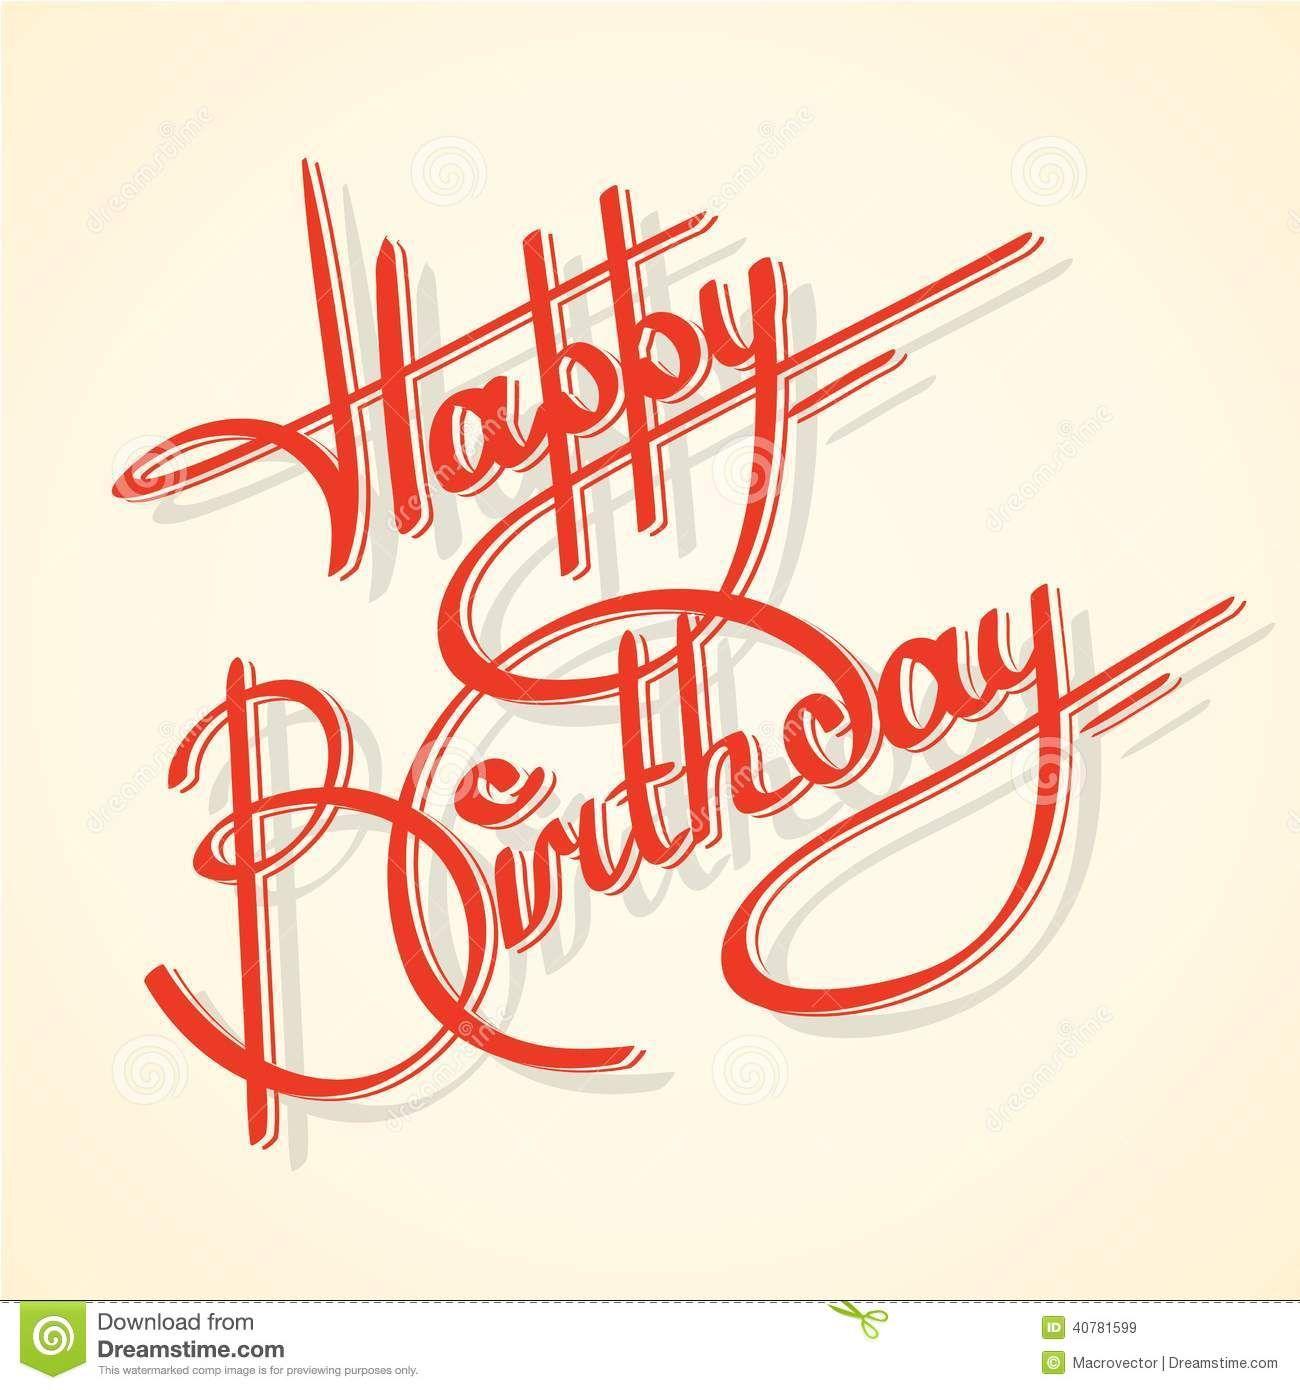 Happy Birthday Lettering Maker ~ Http imgkid happy birthday writing fonts shtml cards to make pinterest